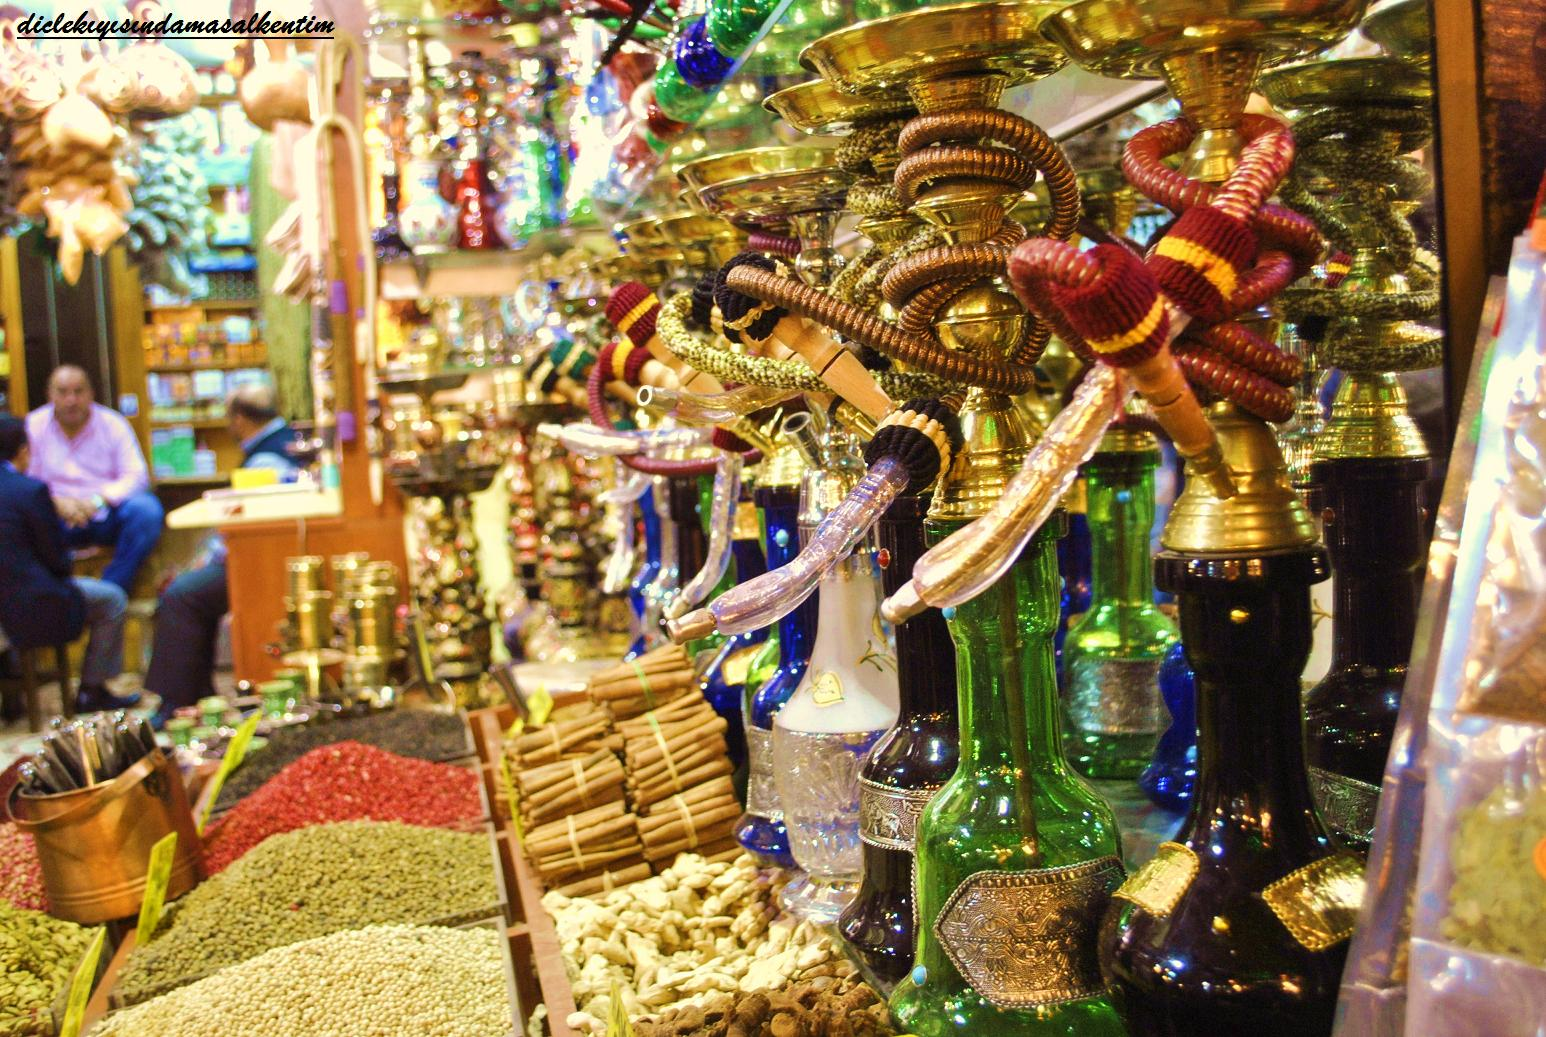 History of Turkey: Spice Bazaar, Mısır Çarşısı, or Egyptian Bazaar